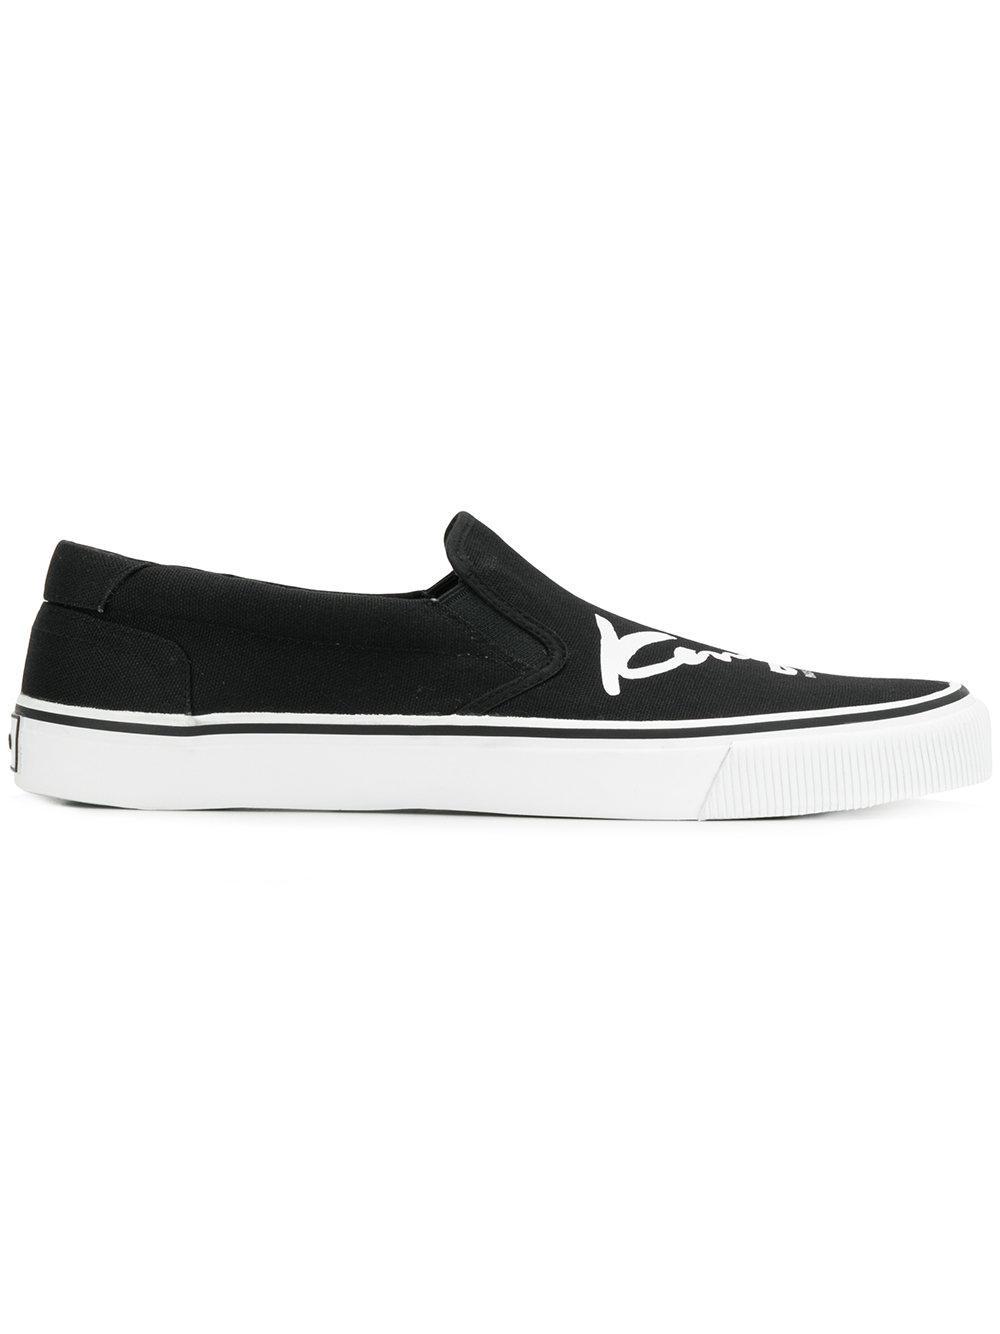 Kenzo Signature Slip-on Sneakers - Black